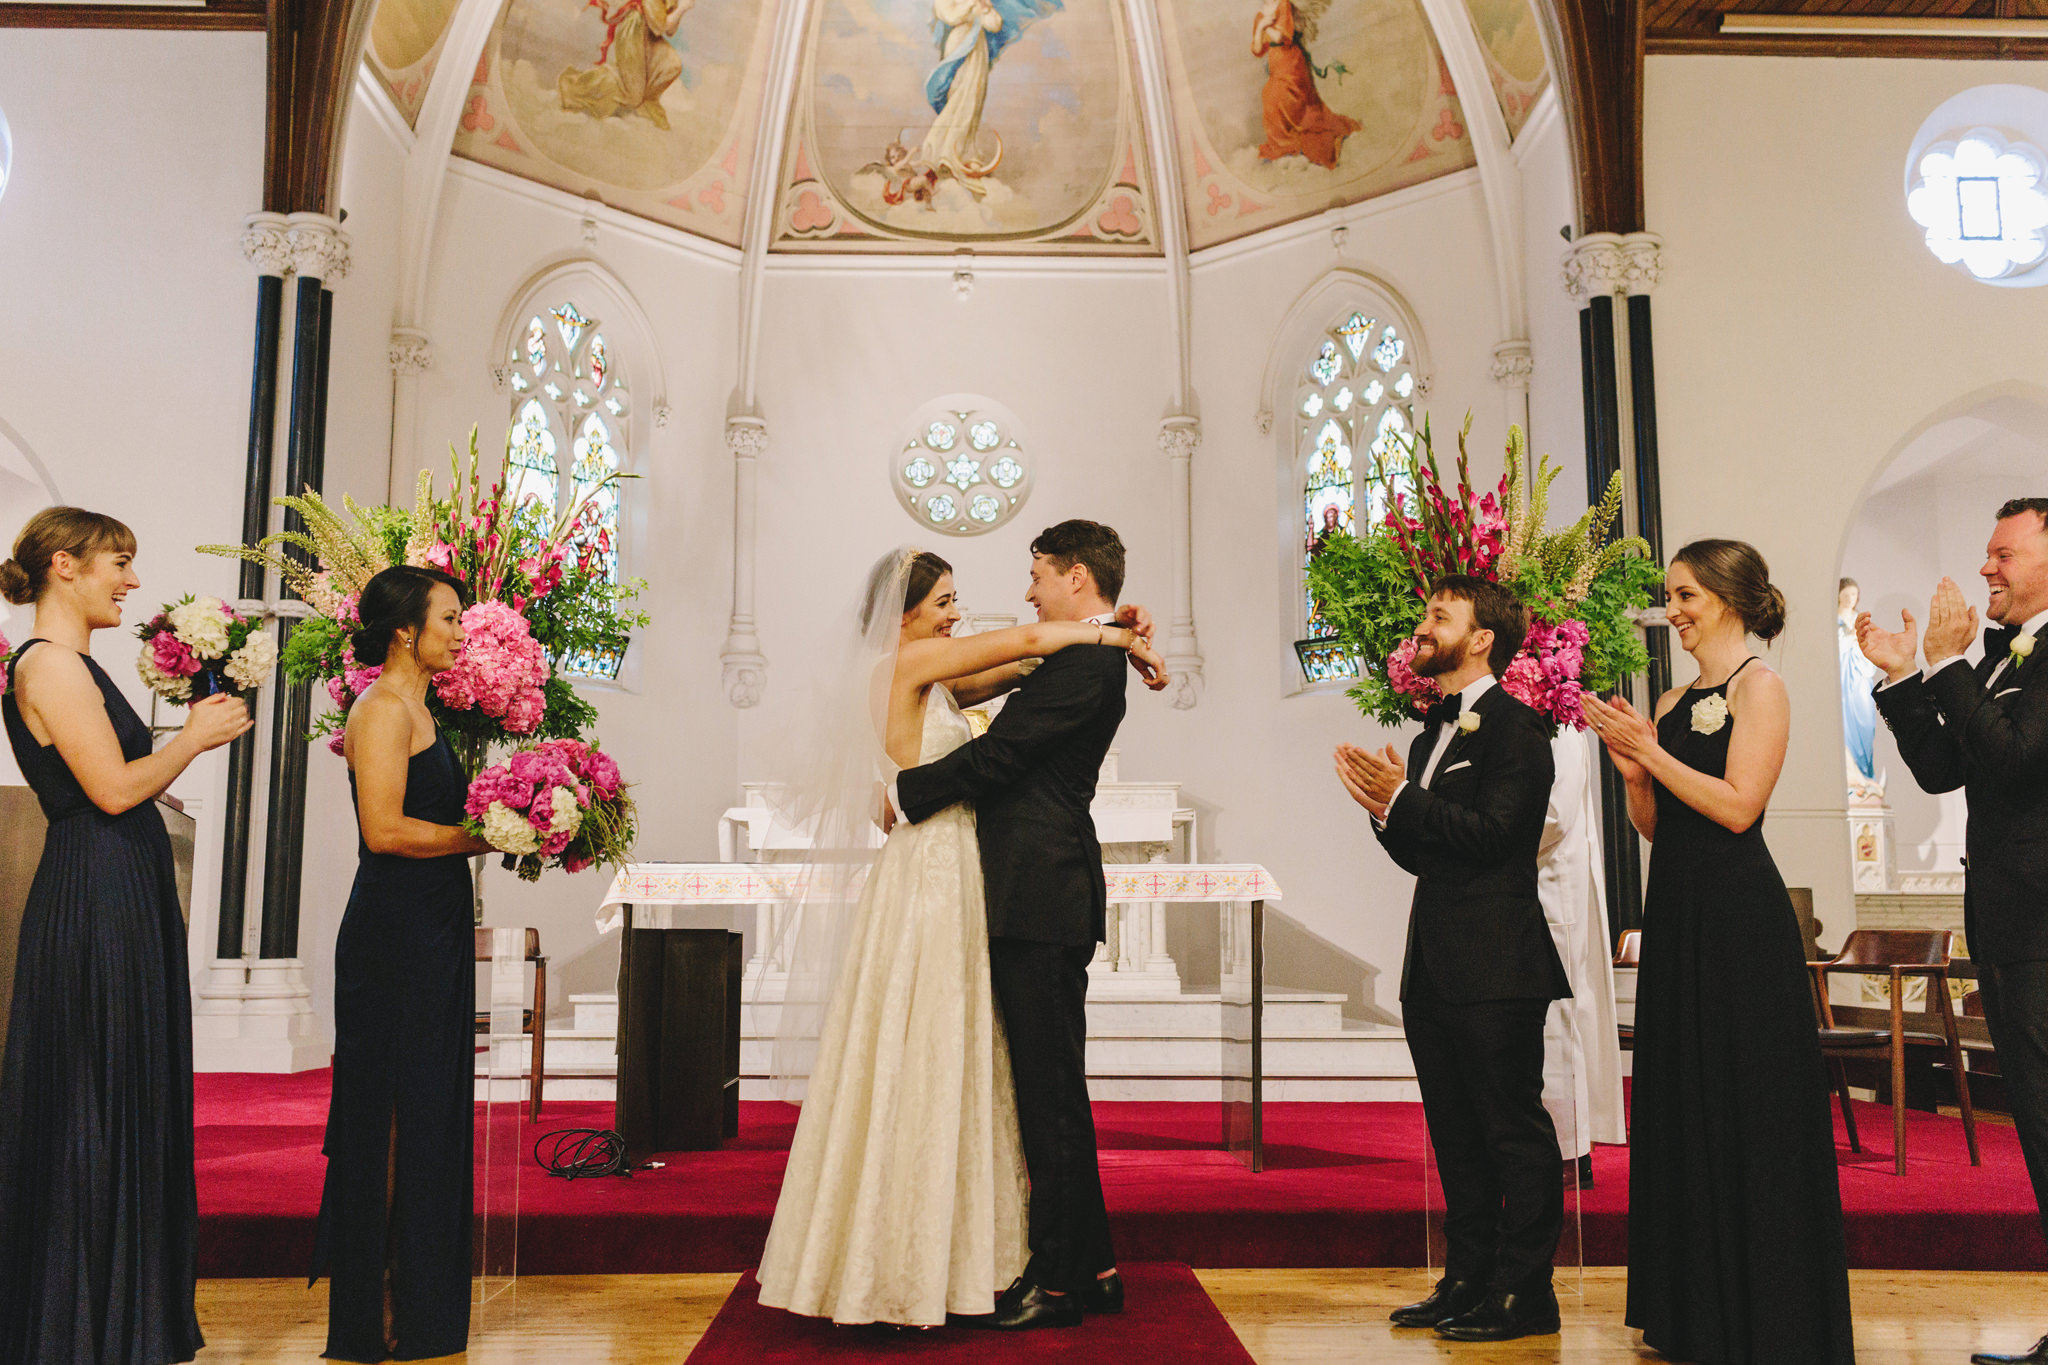 Abbotsford_Convent_Wedding_Peter_Anna067.JPG